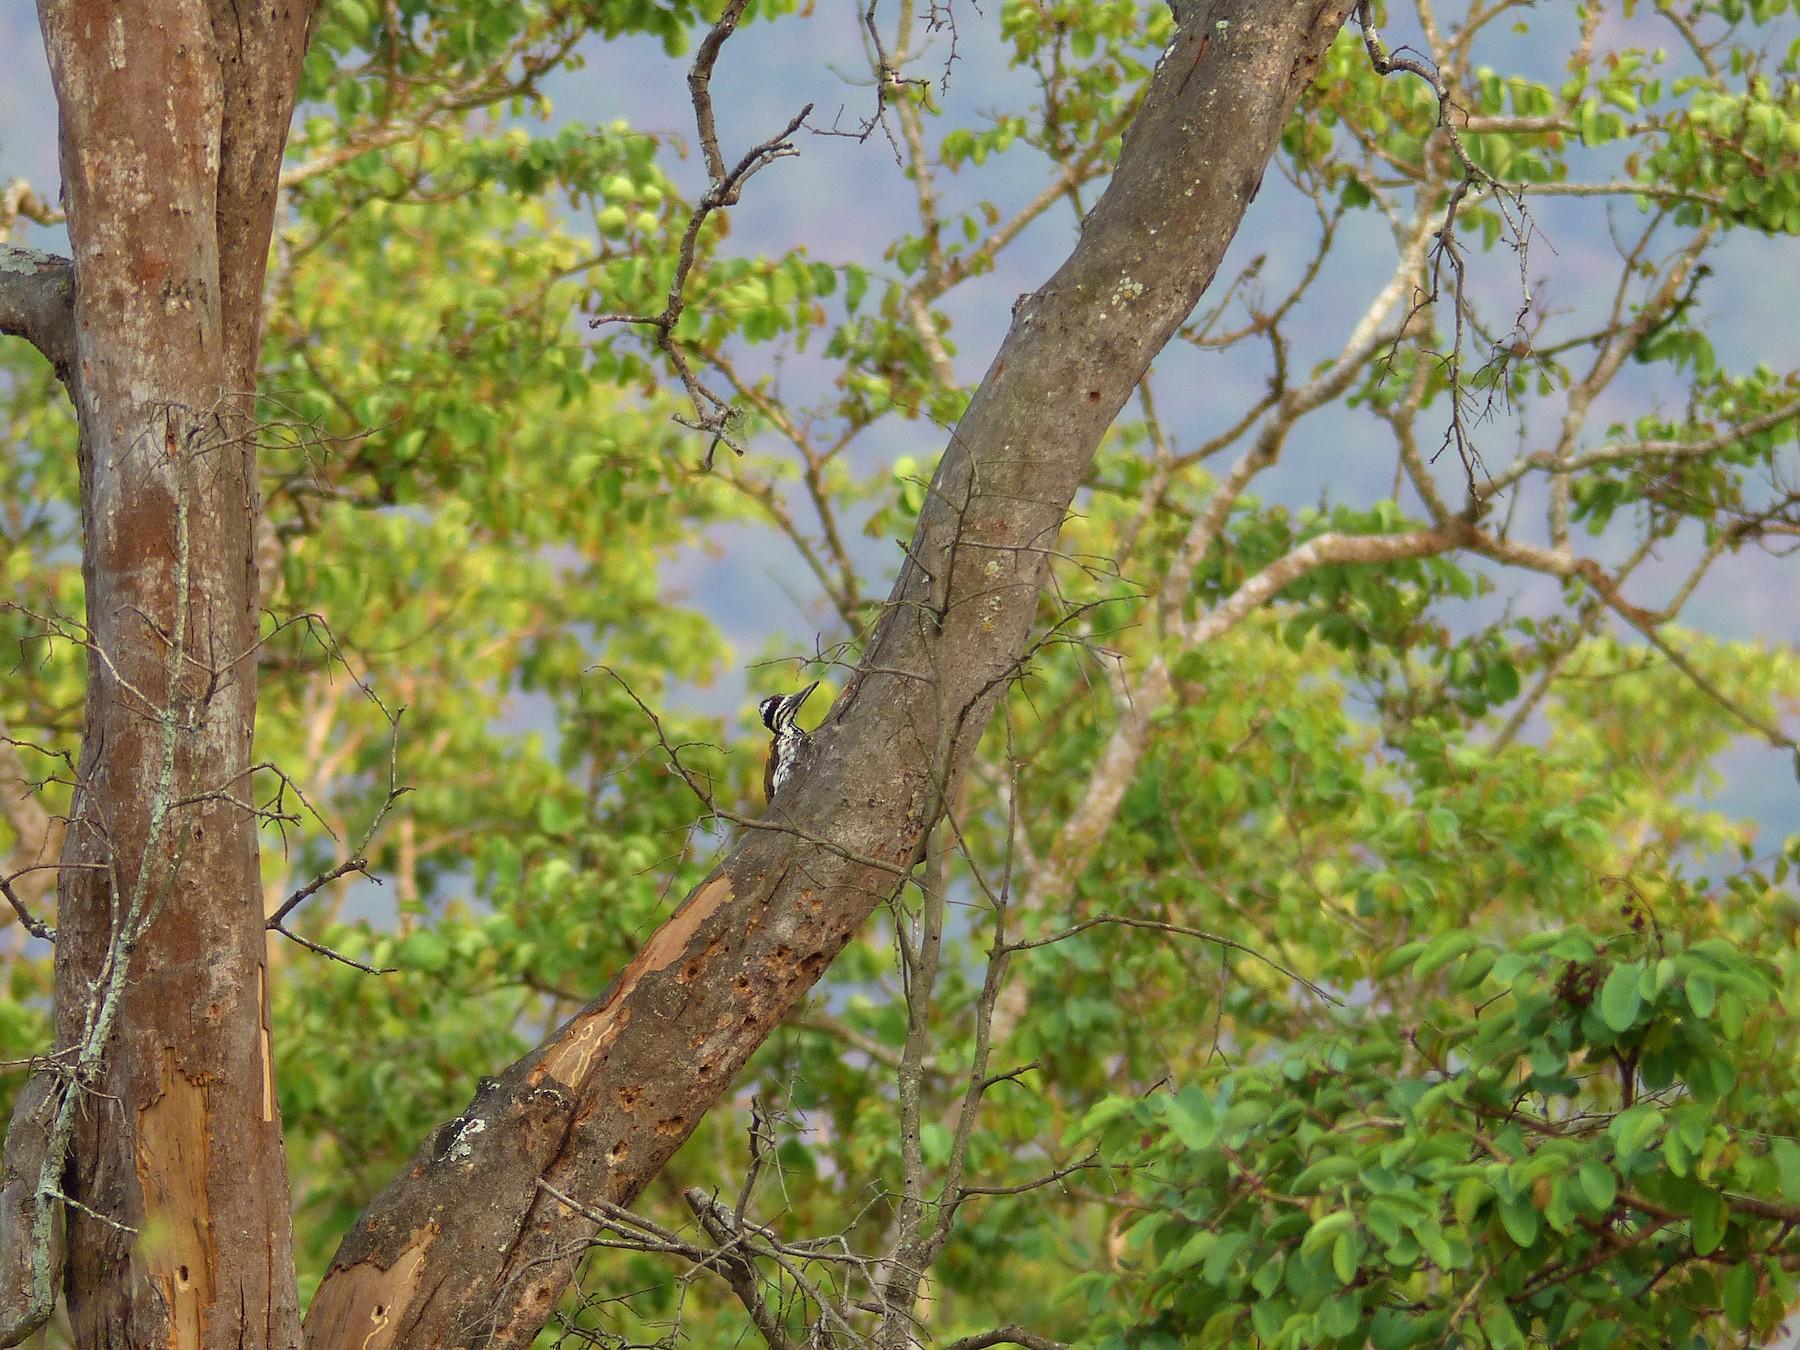 White-naped Woodpecker - Ashwin Viswanathan